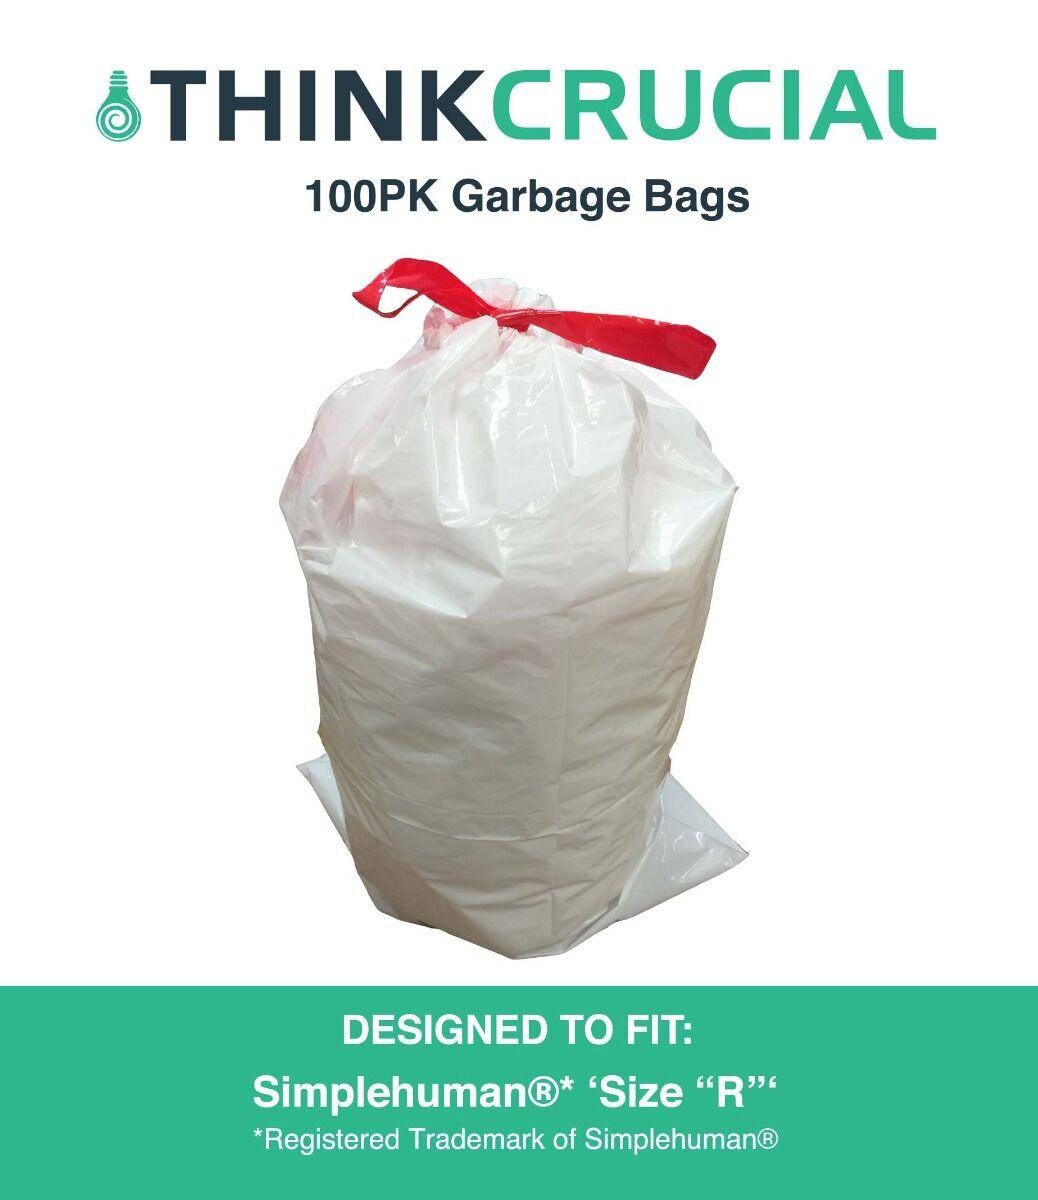 100 REPL Simplehuman® Durable Garbage Bags Größe R, 10L   2.6 Gallon